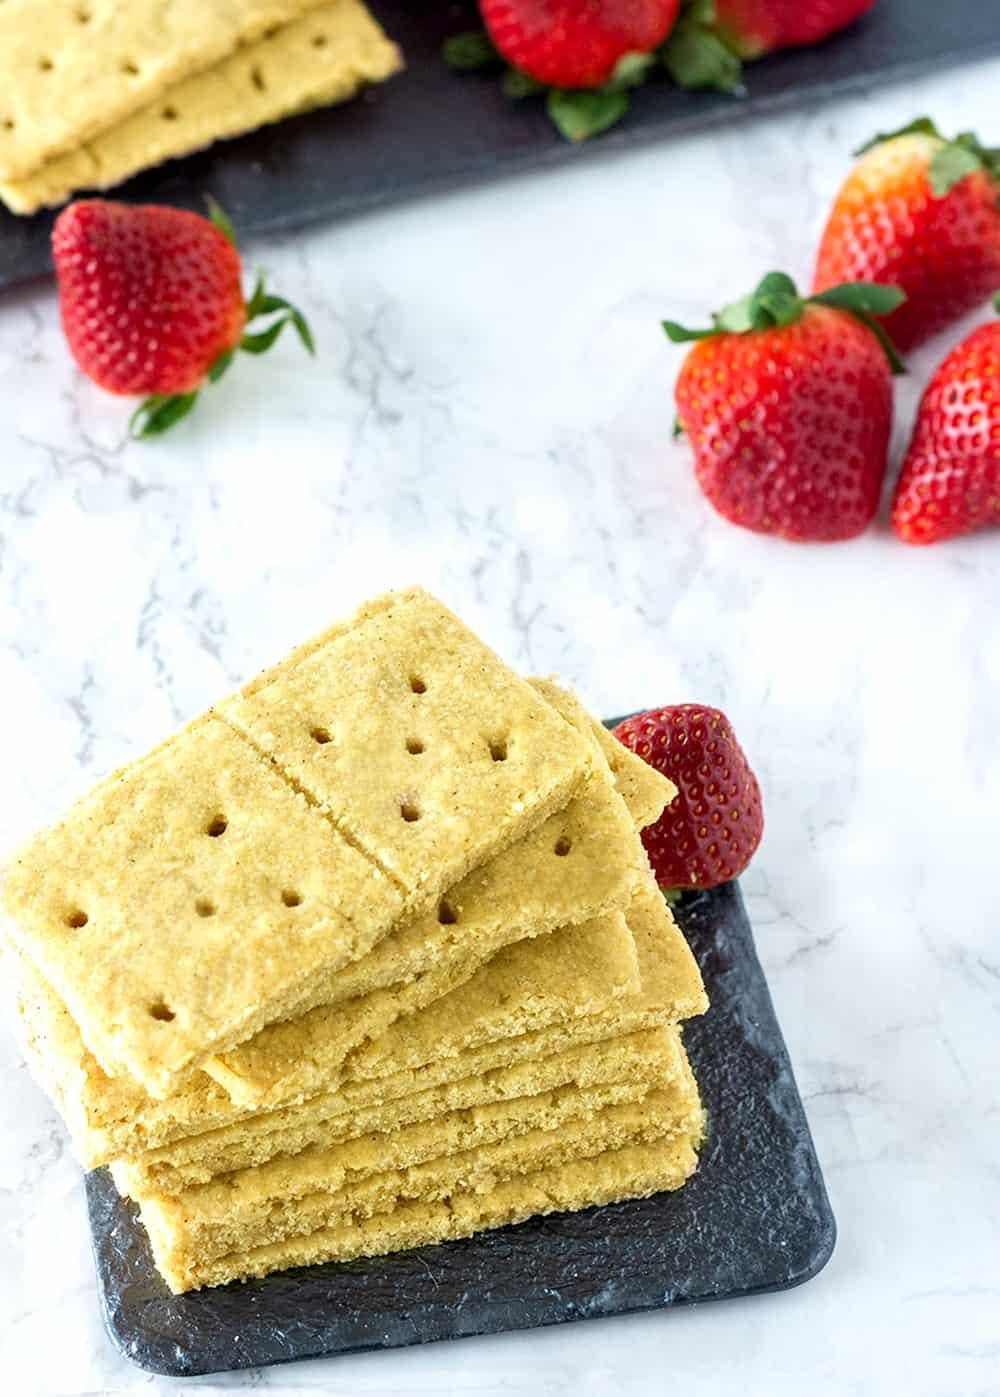 gluten free graham cracker crumbs substitute